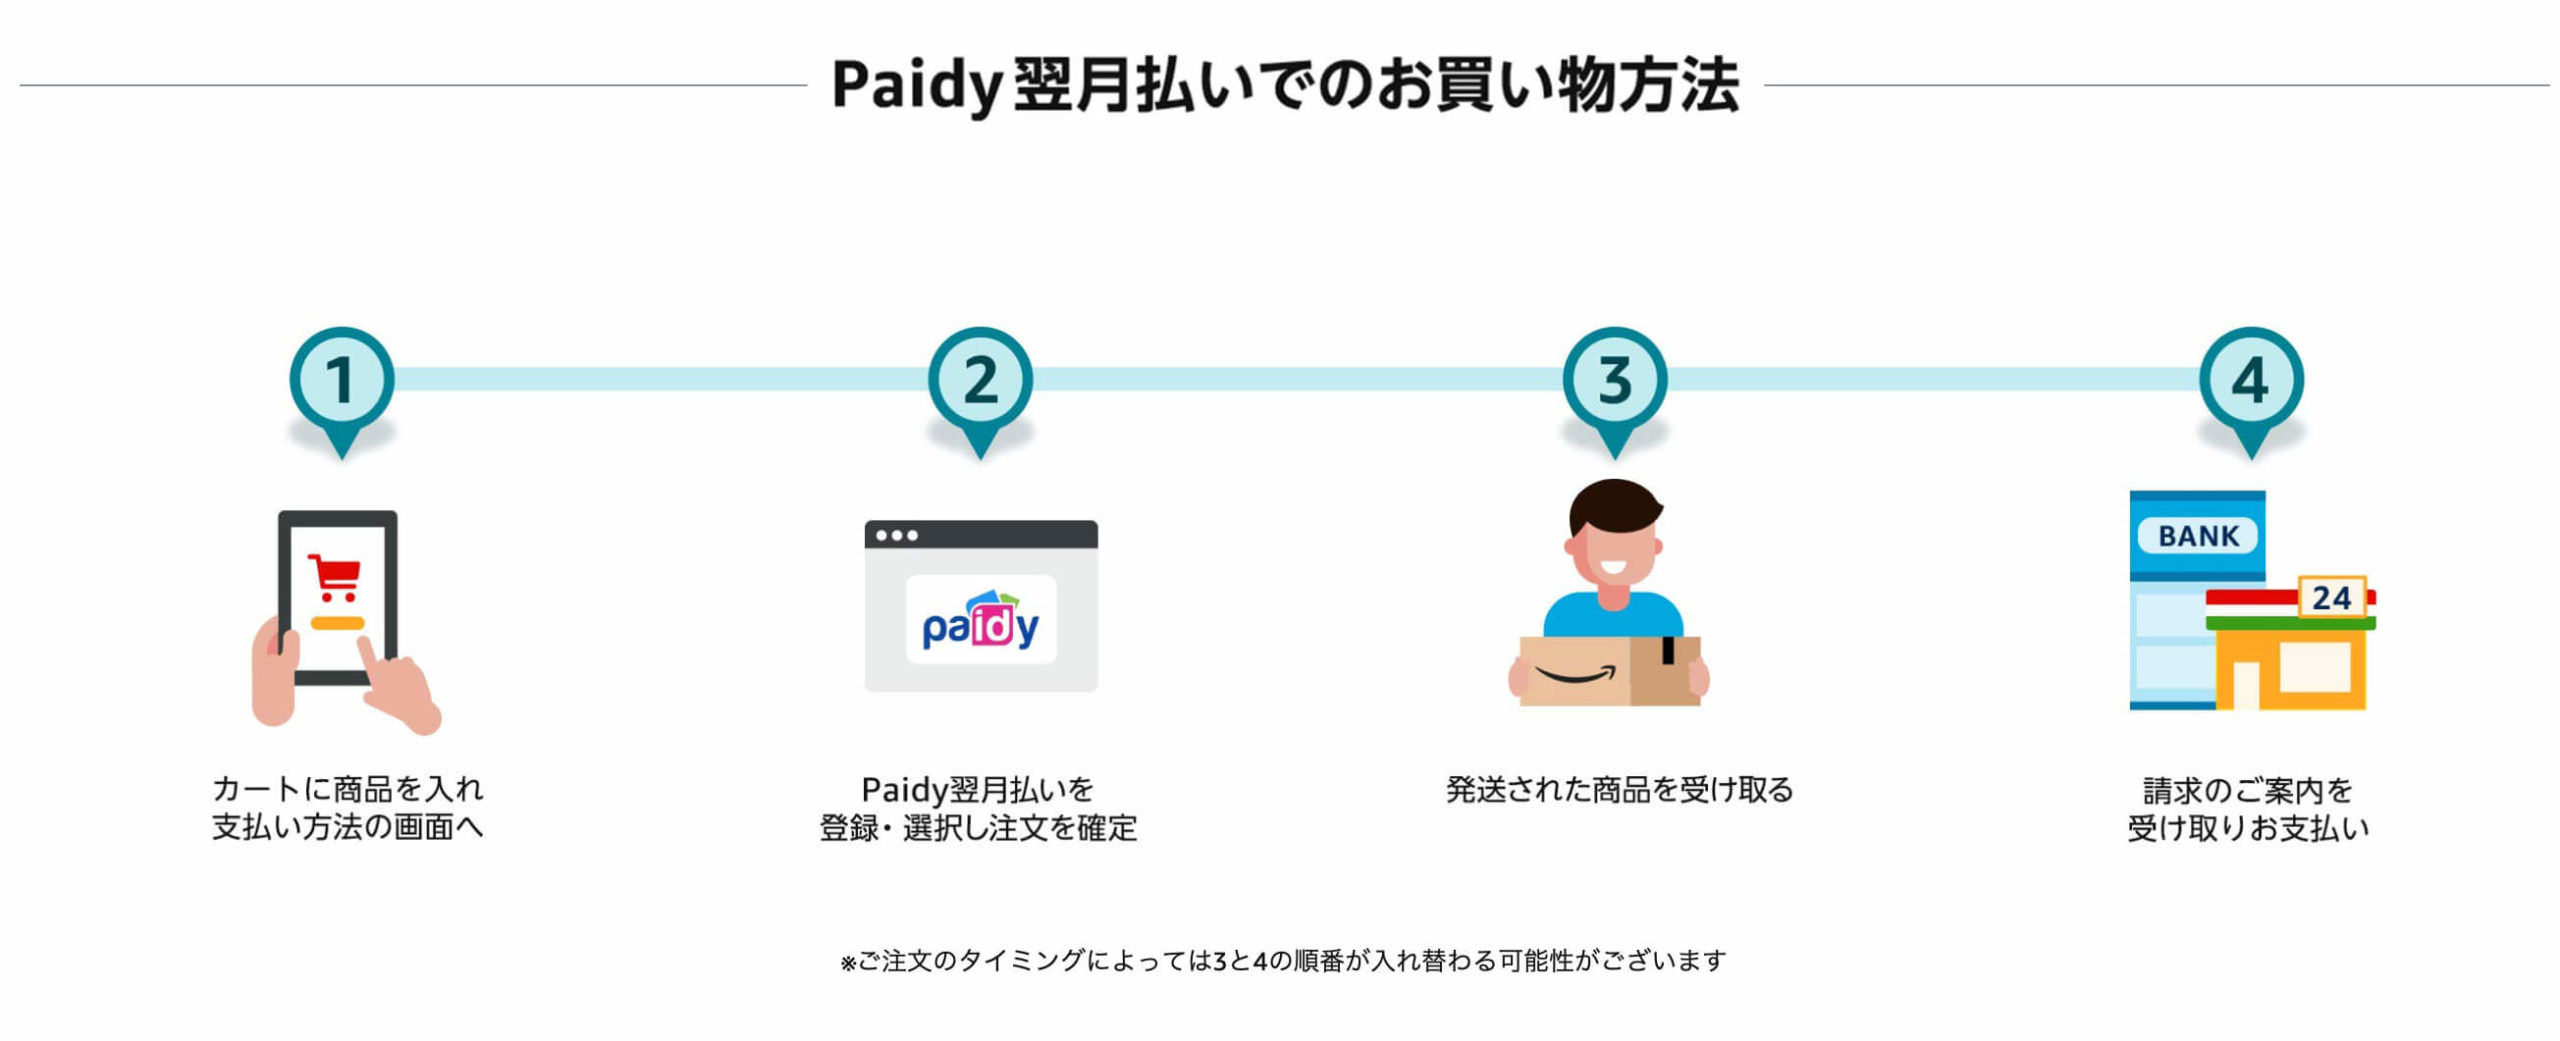 Paidy翌月払い手順